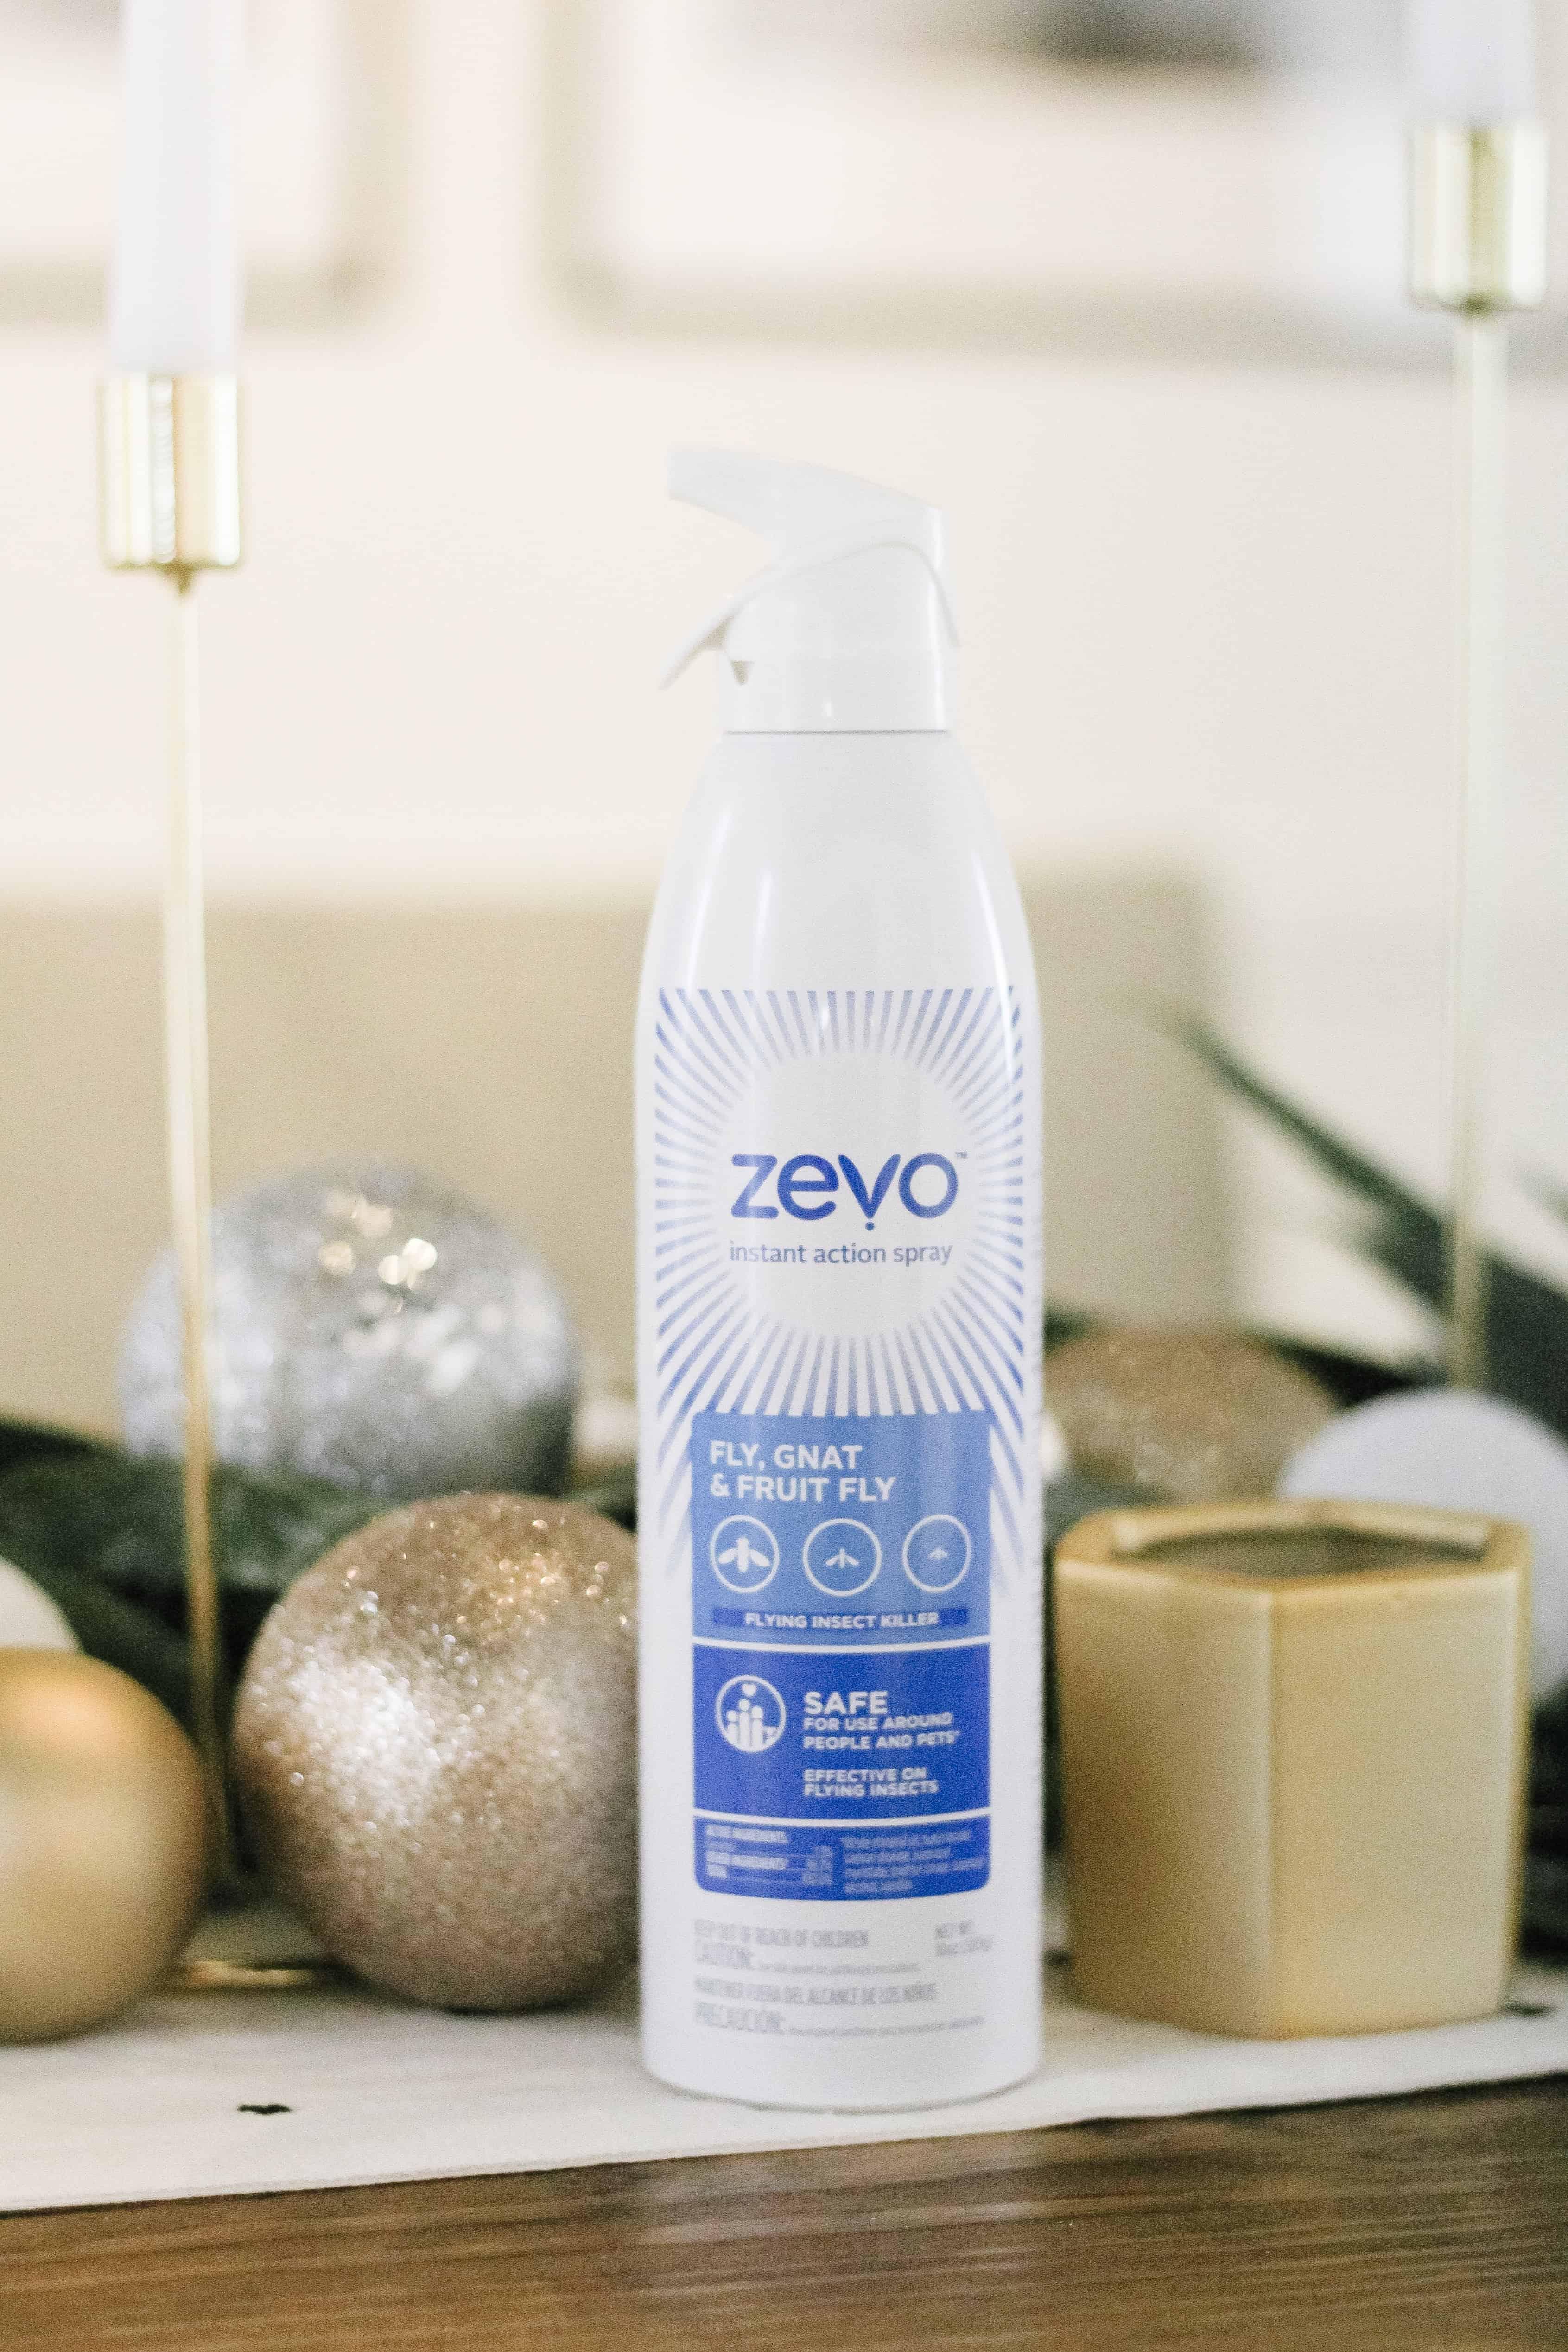 bottle of Zevo Bug spray on a table